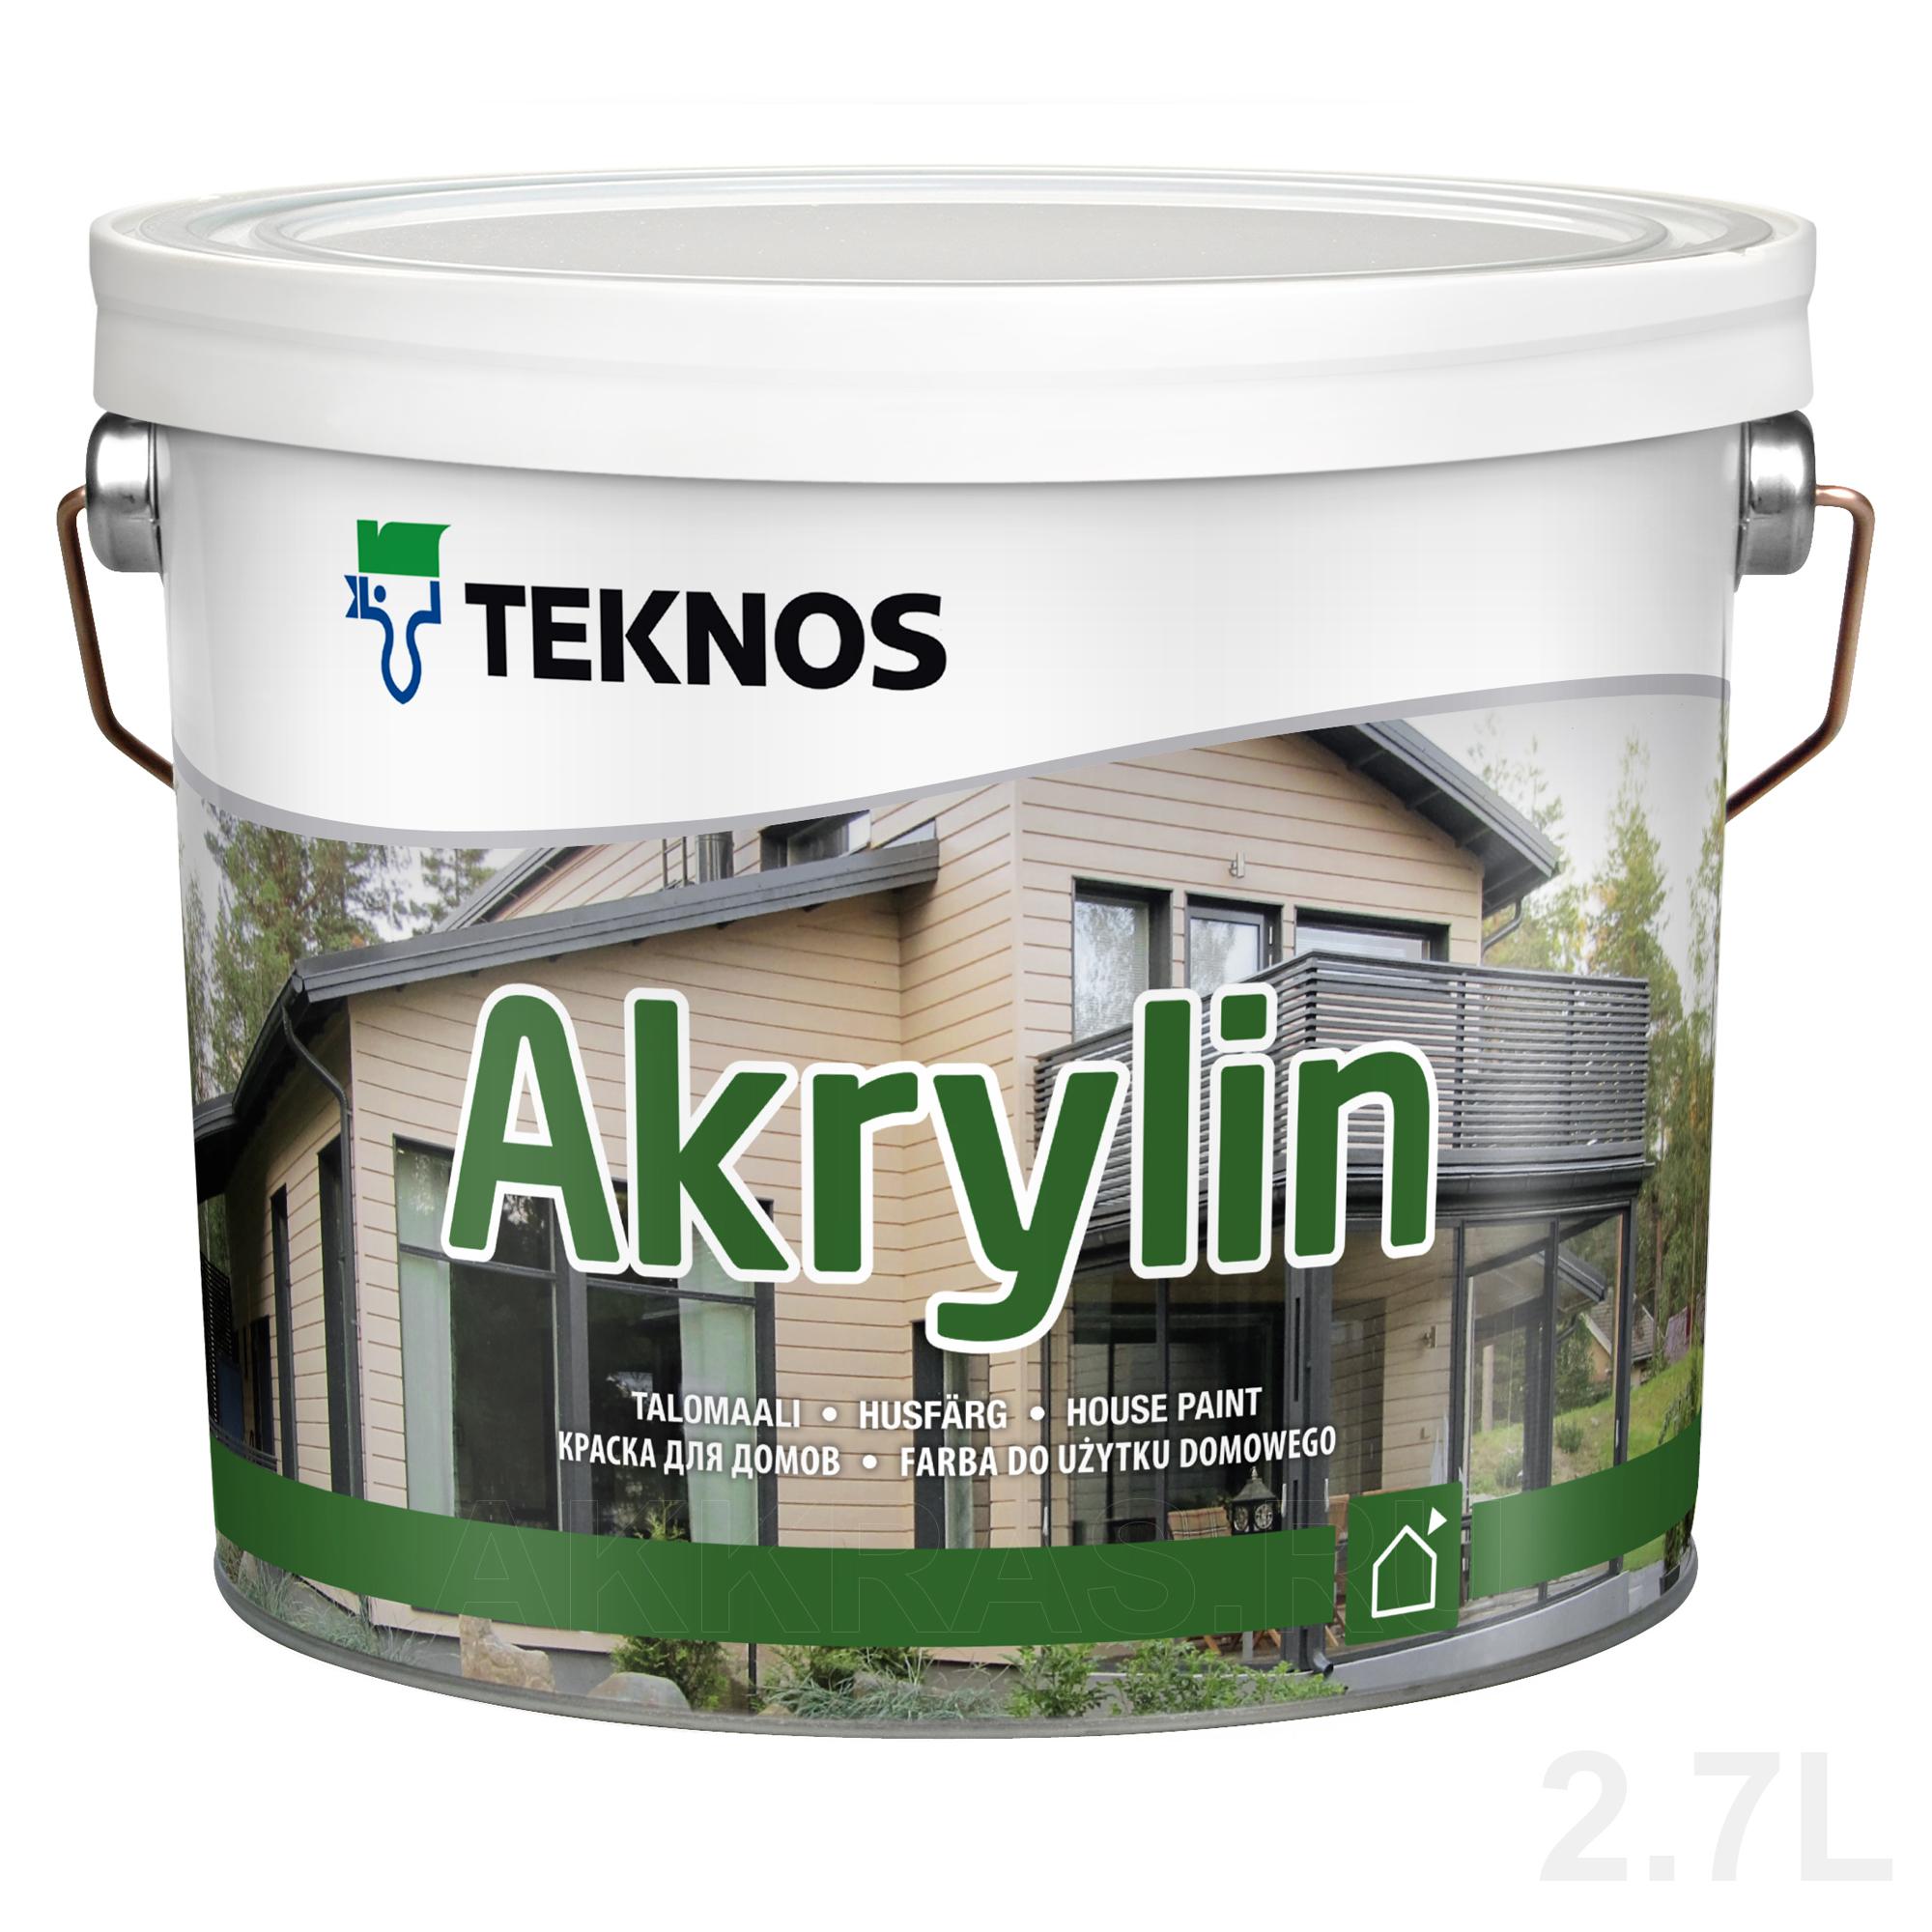 Teknos Akrylin белая, 2,7 л, Краска фасадная по дереву акрилатная фото